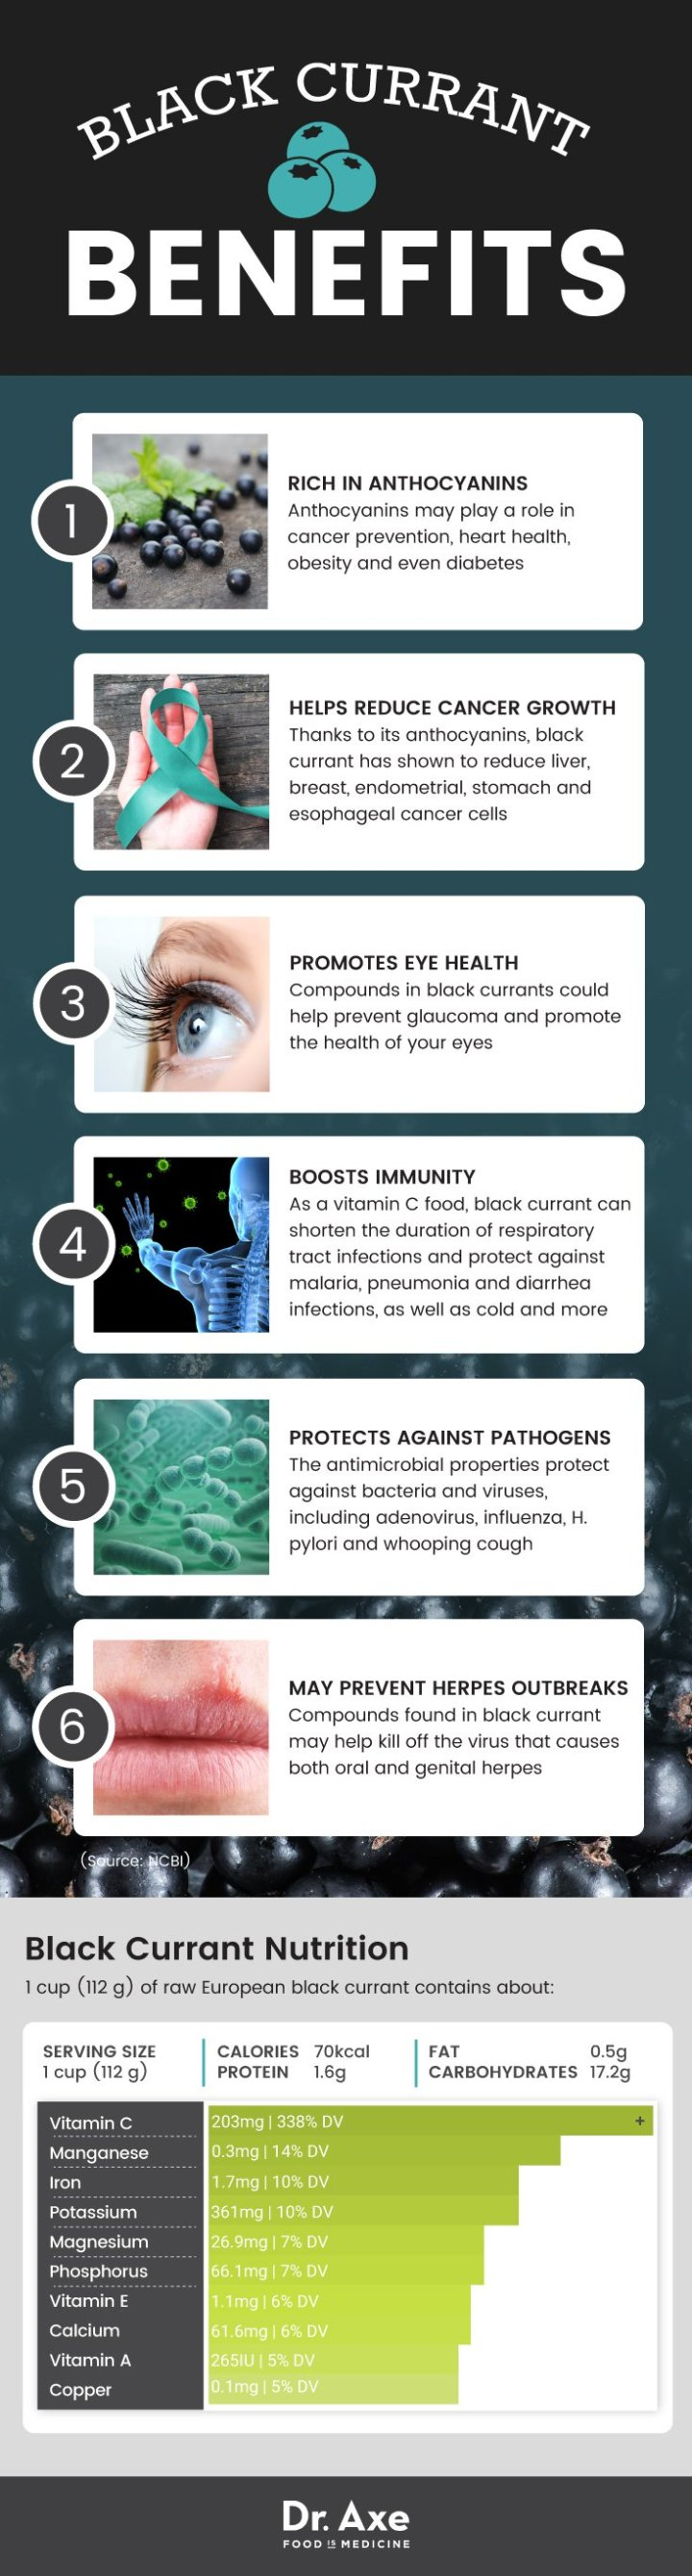 Black currant benefits - Dr. Axe